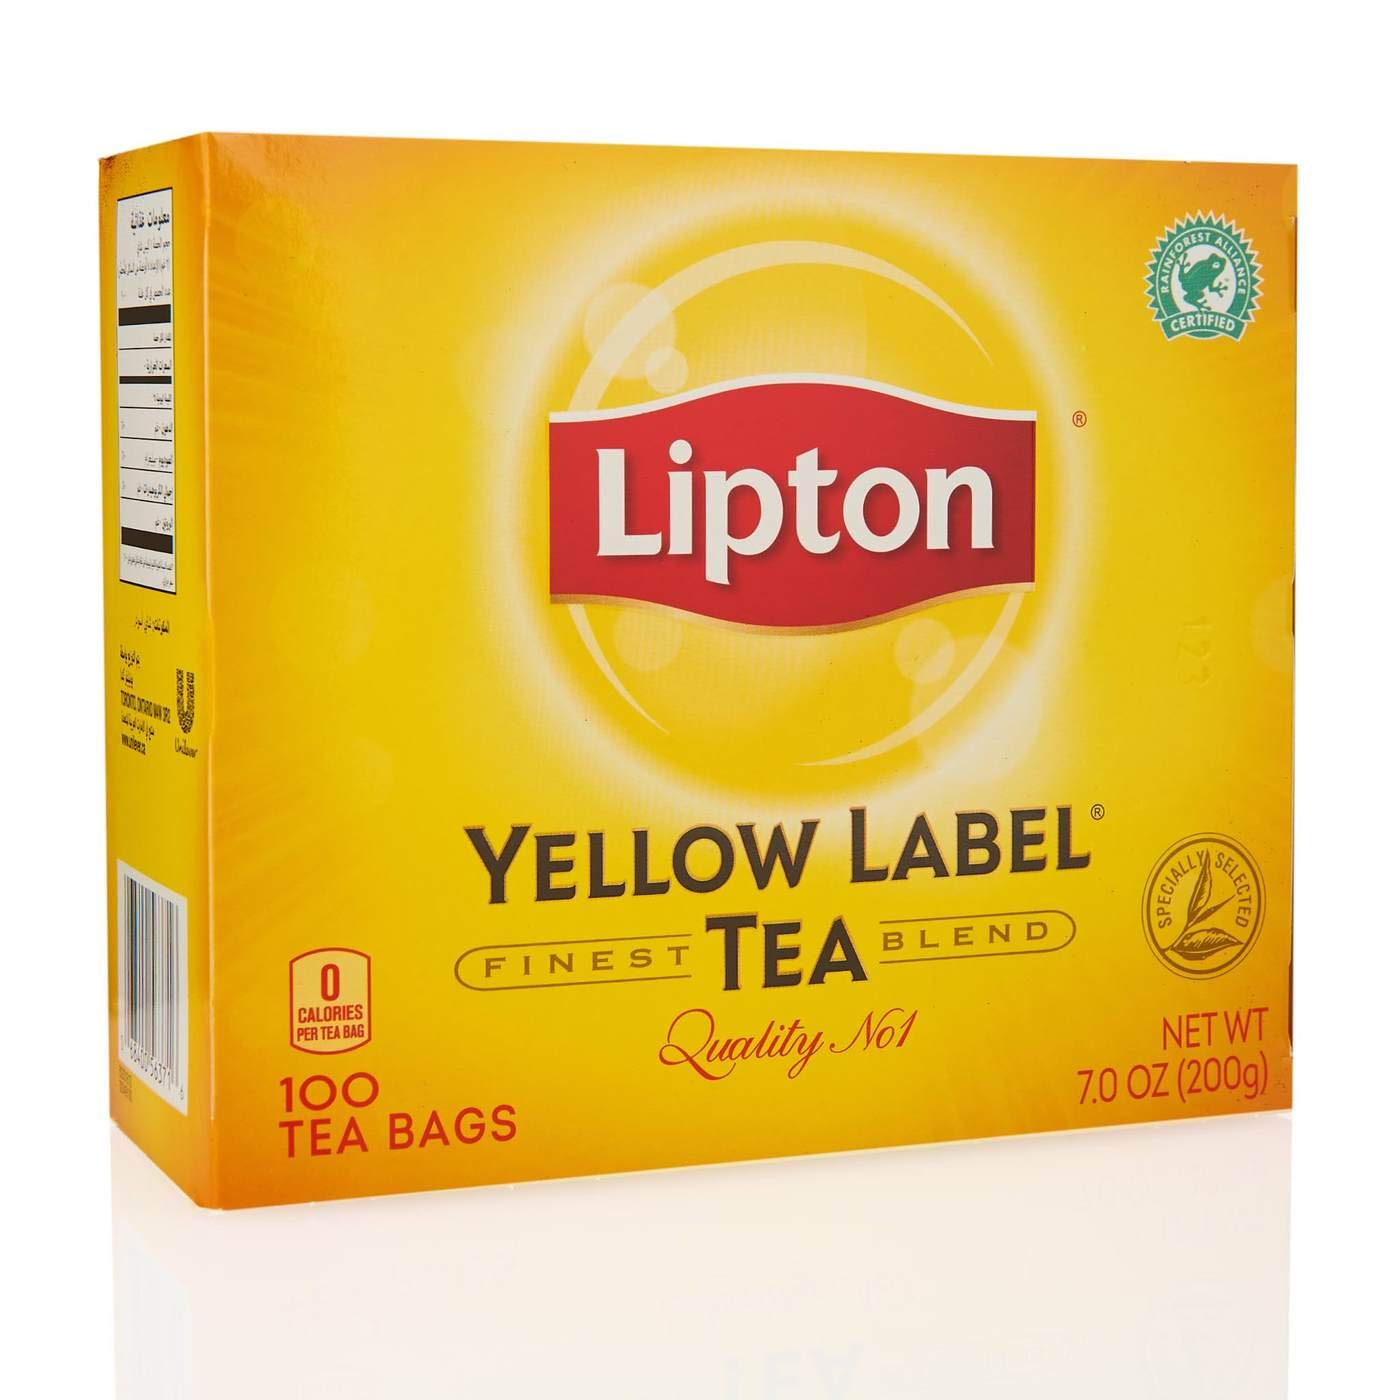 Lipton Yellow Label Tea Bags 100ct, 1 pack